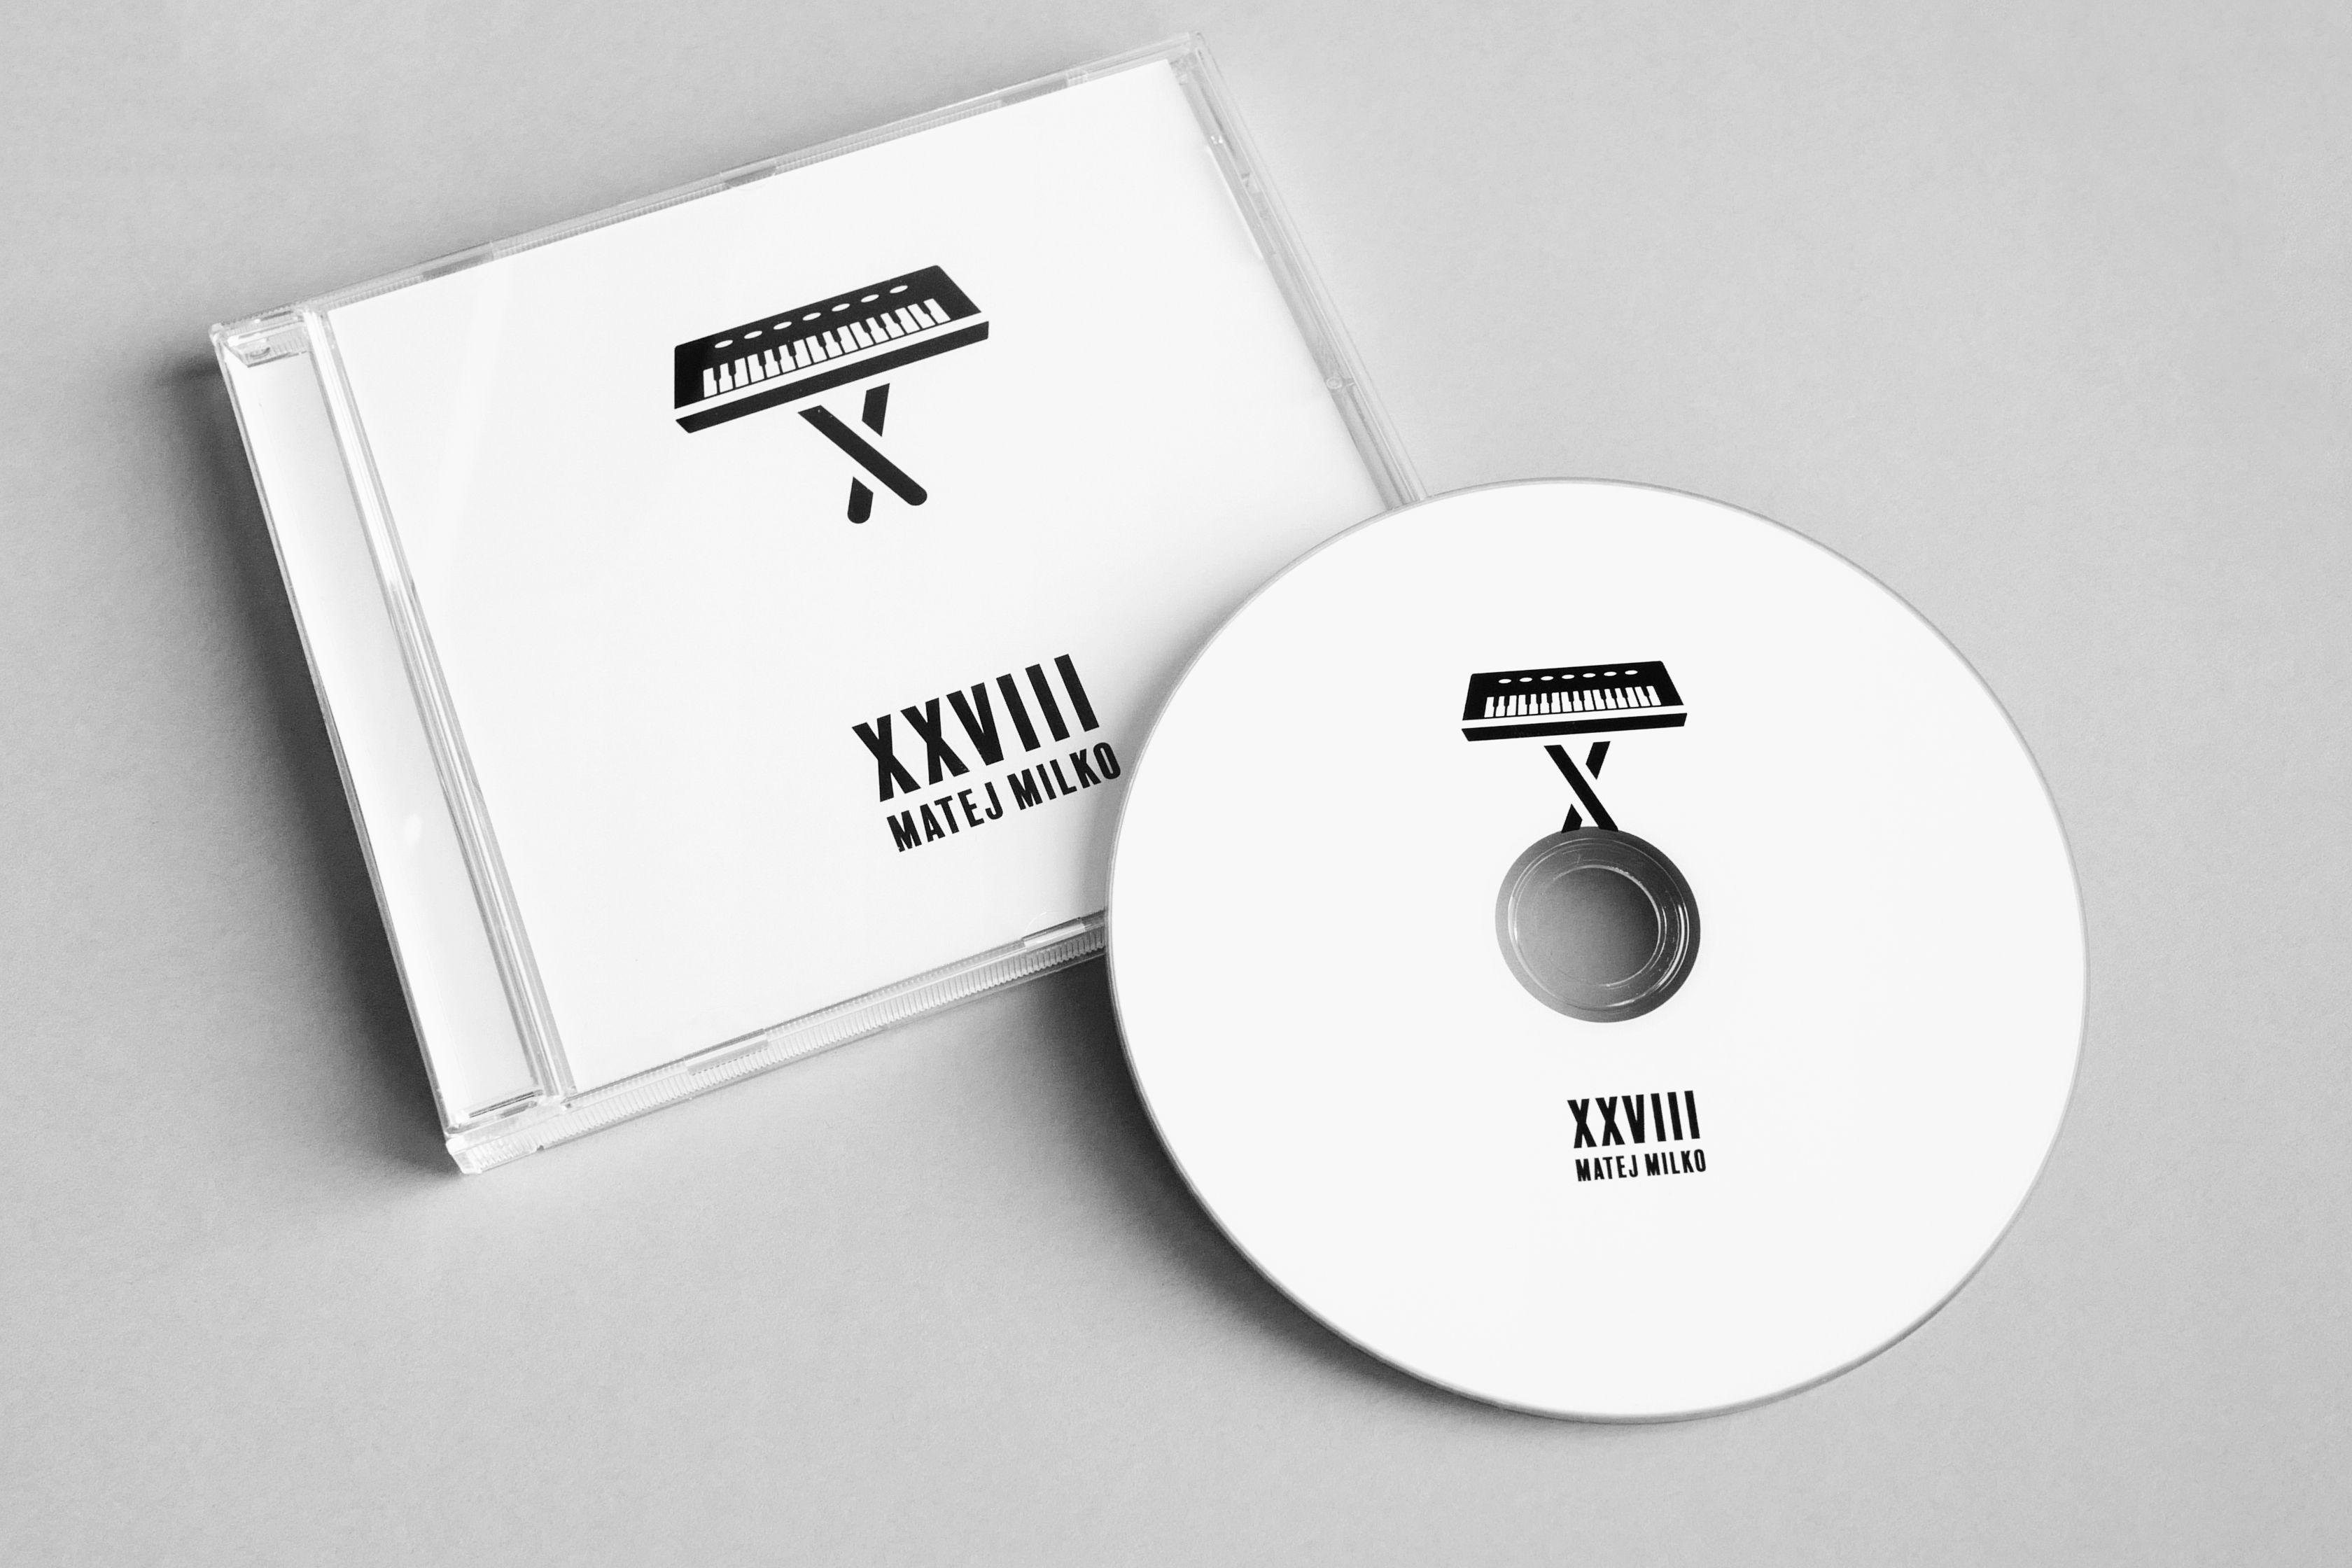 3445cb537950 Matej Milko XXVIII audio cd